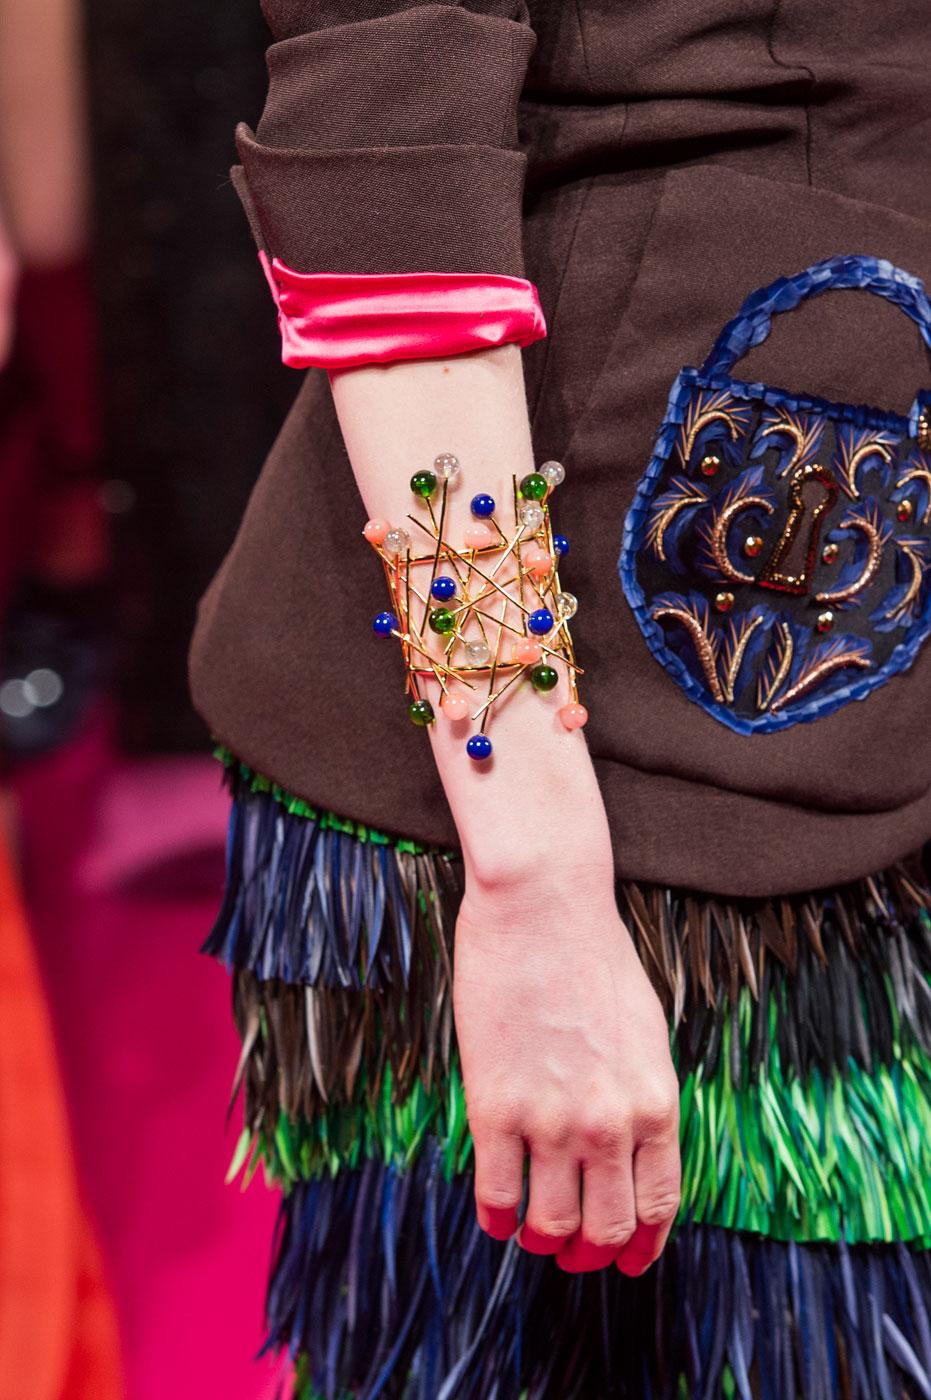 Schiaparelli-fashion-runway-show-close-ups-haute-couture-paris-spring-summer-2015-the-impression-48